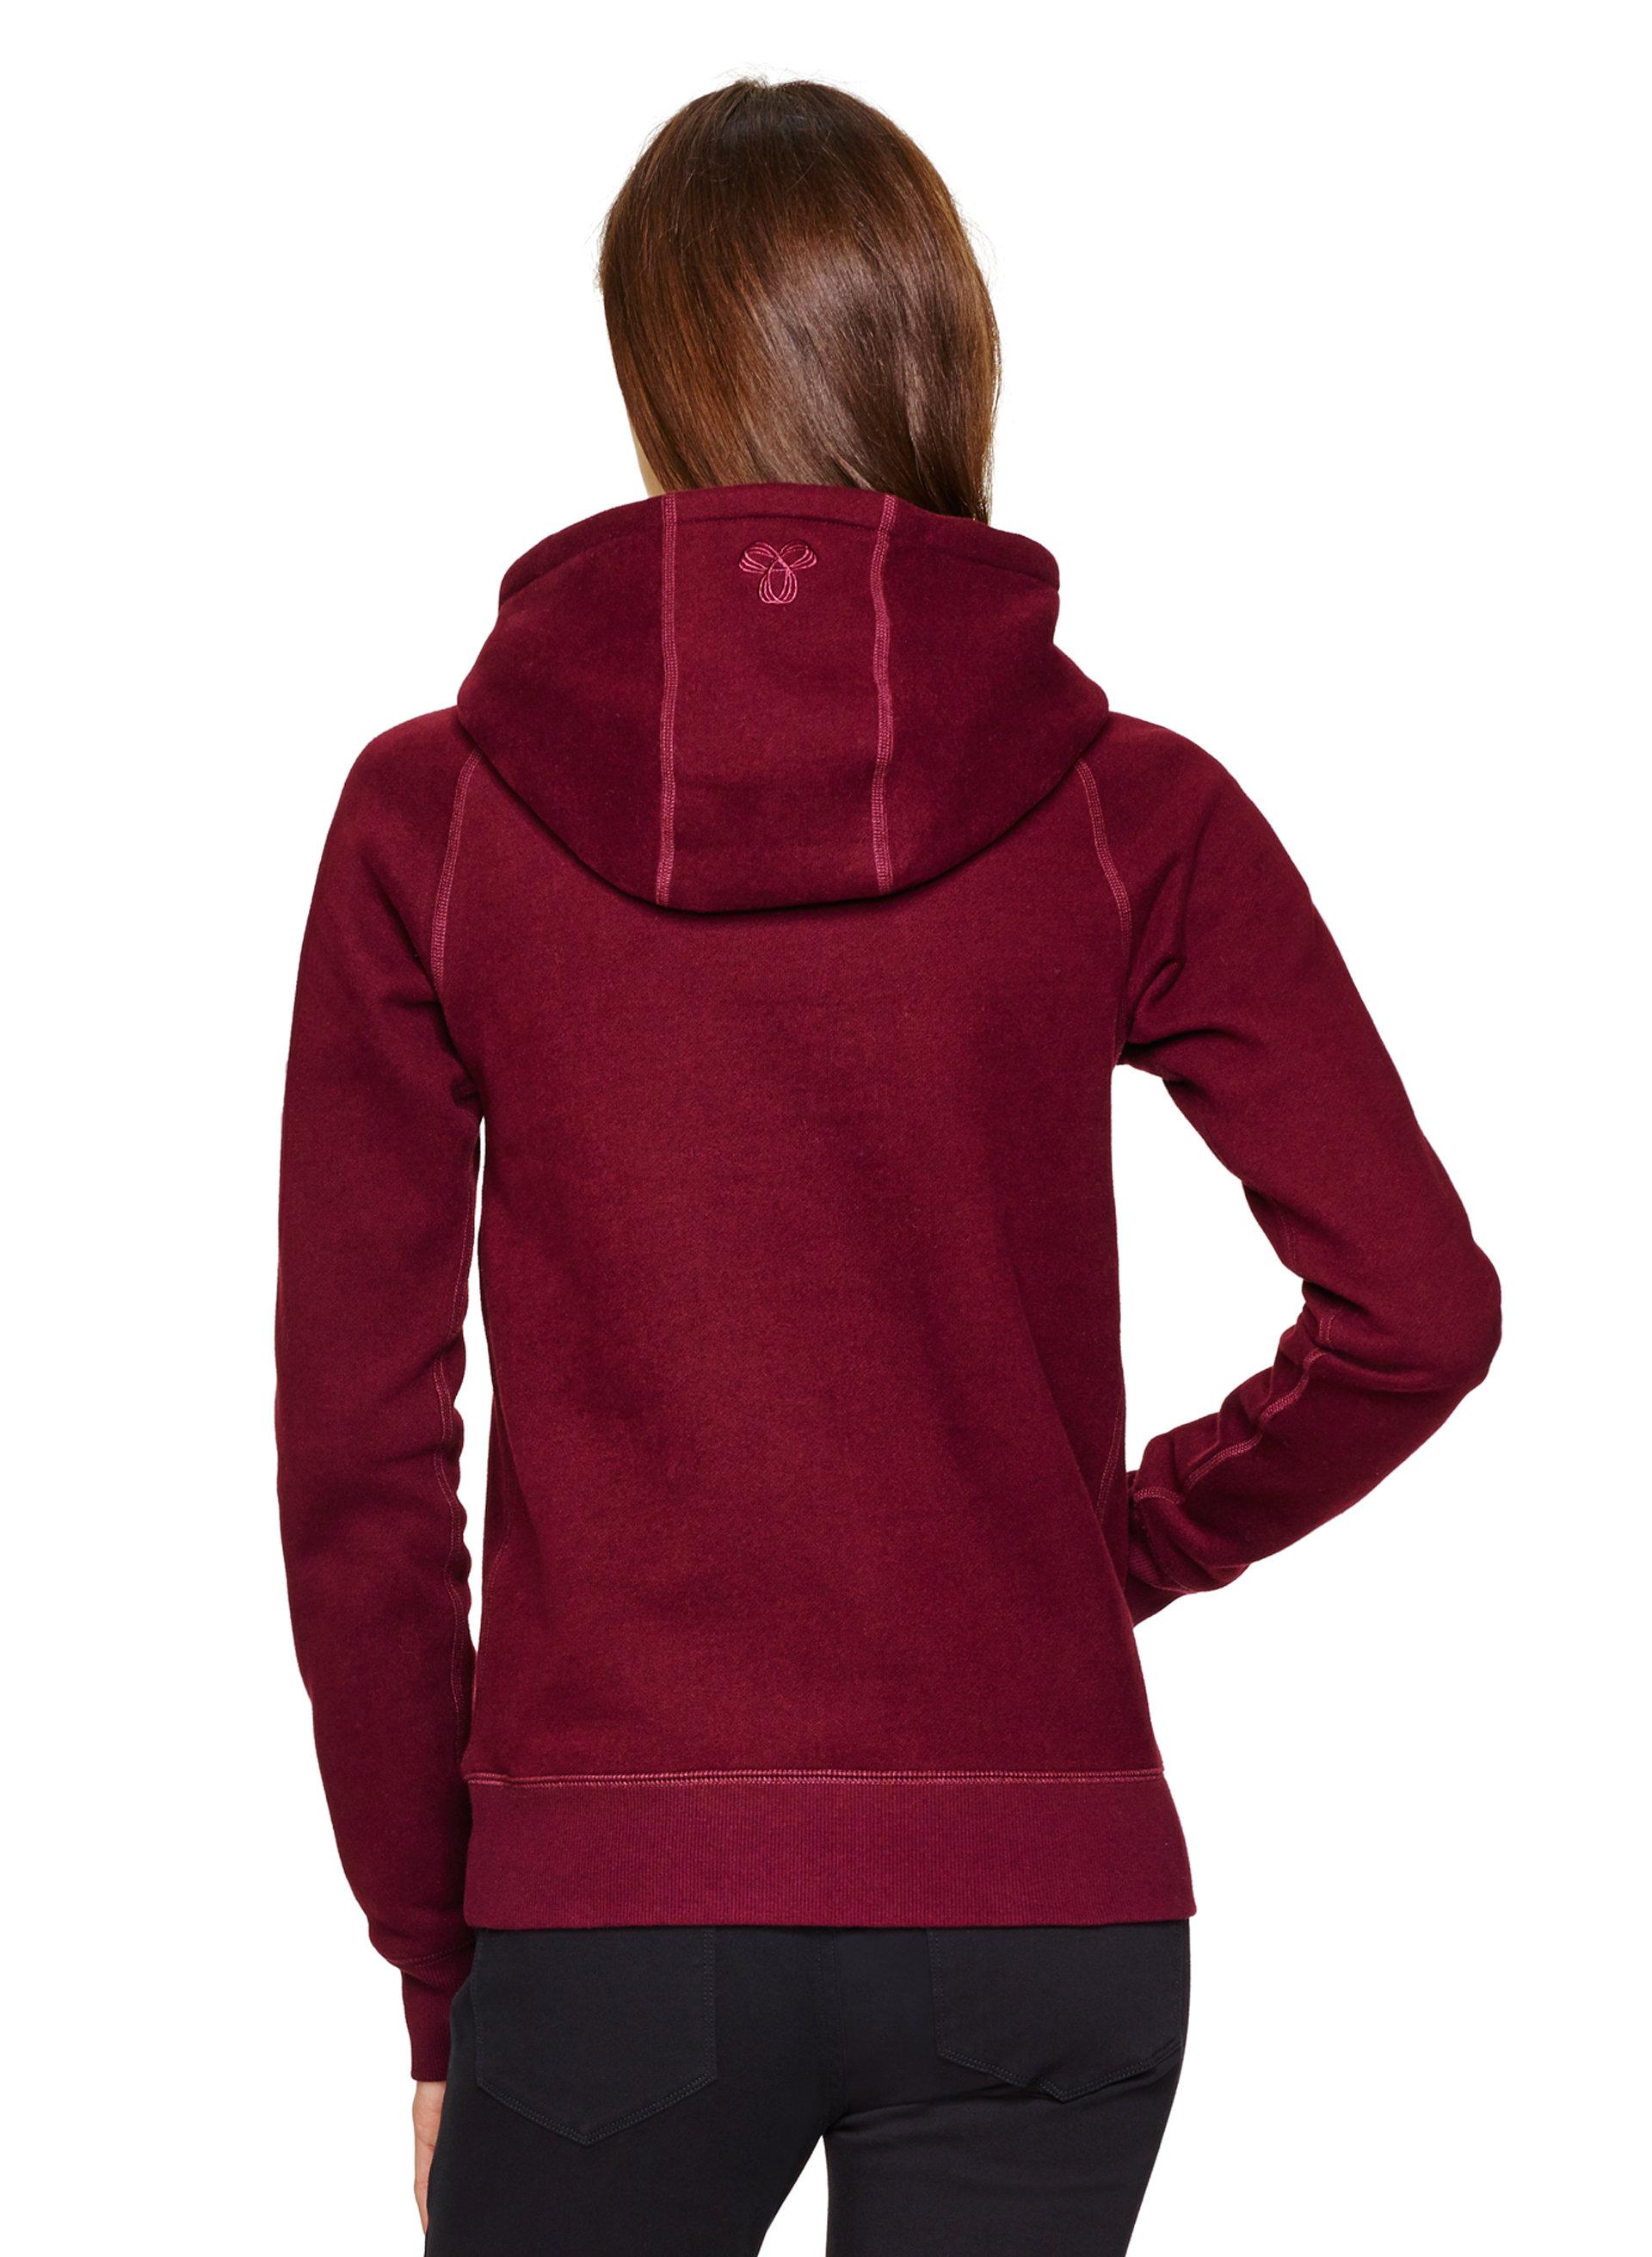 Tna hoodie